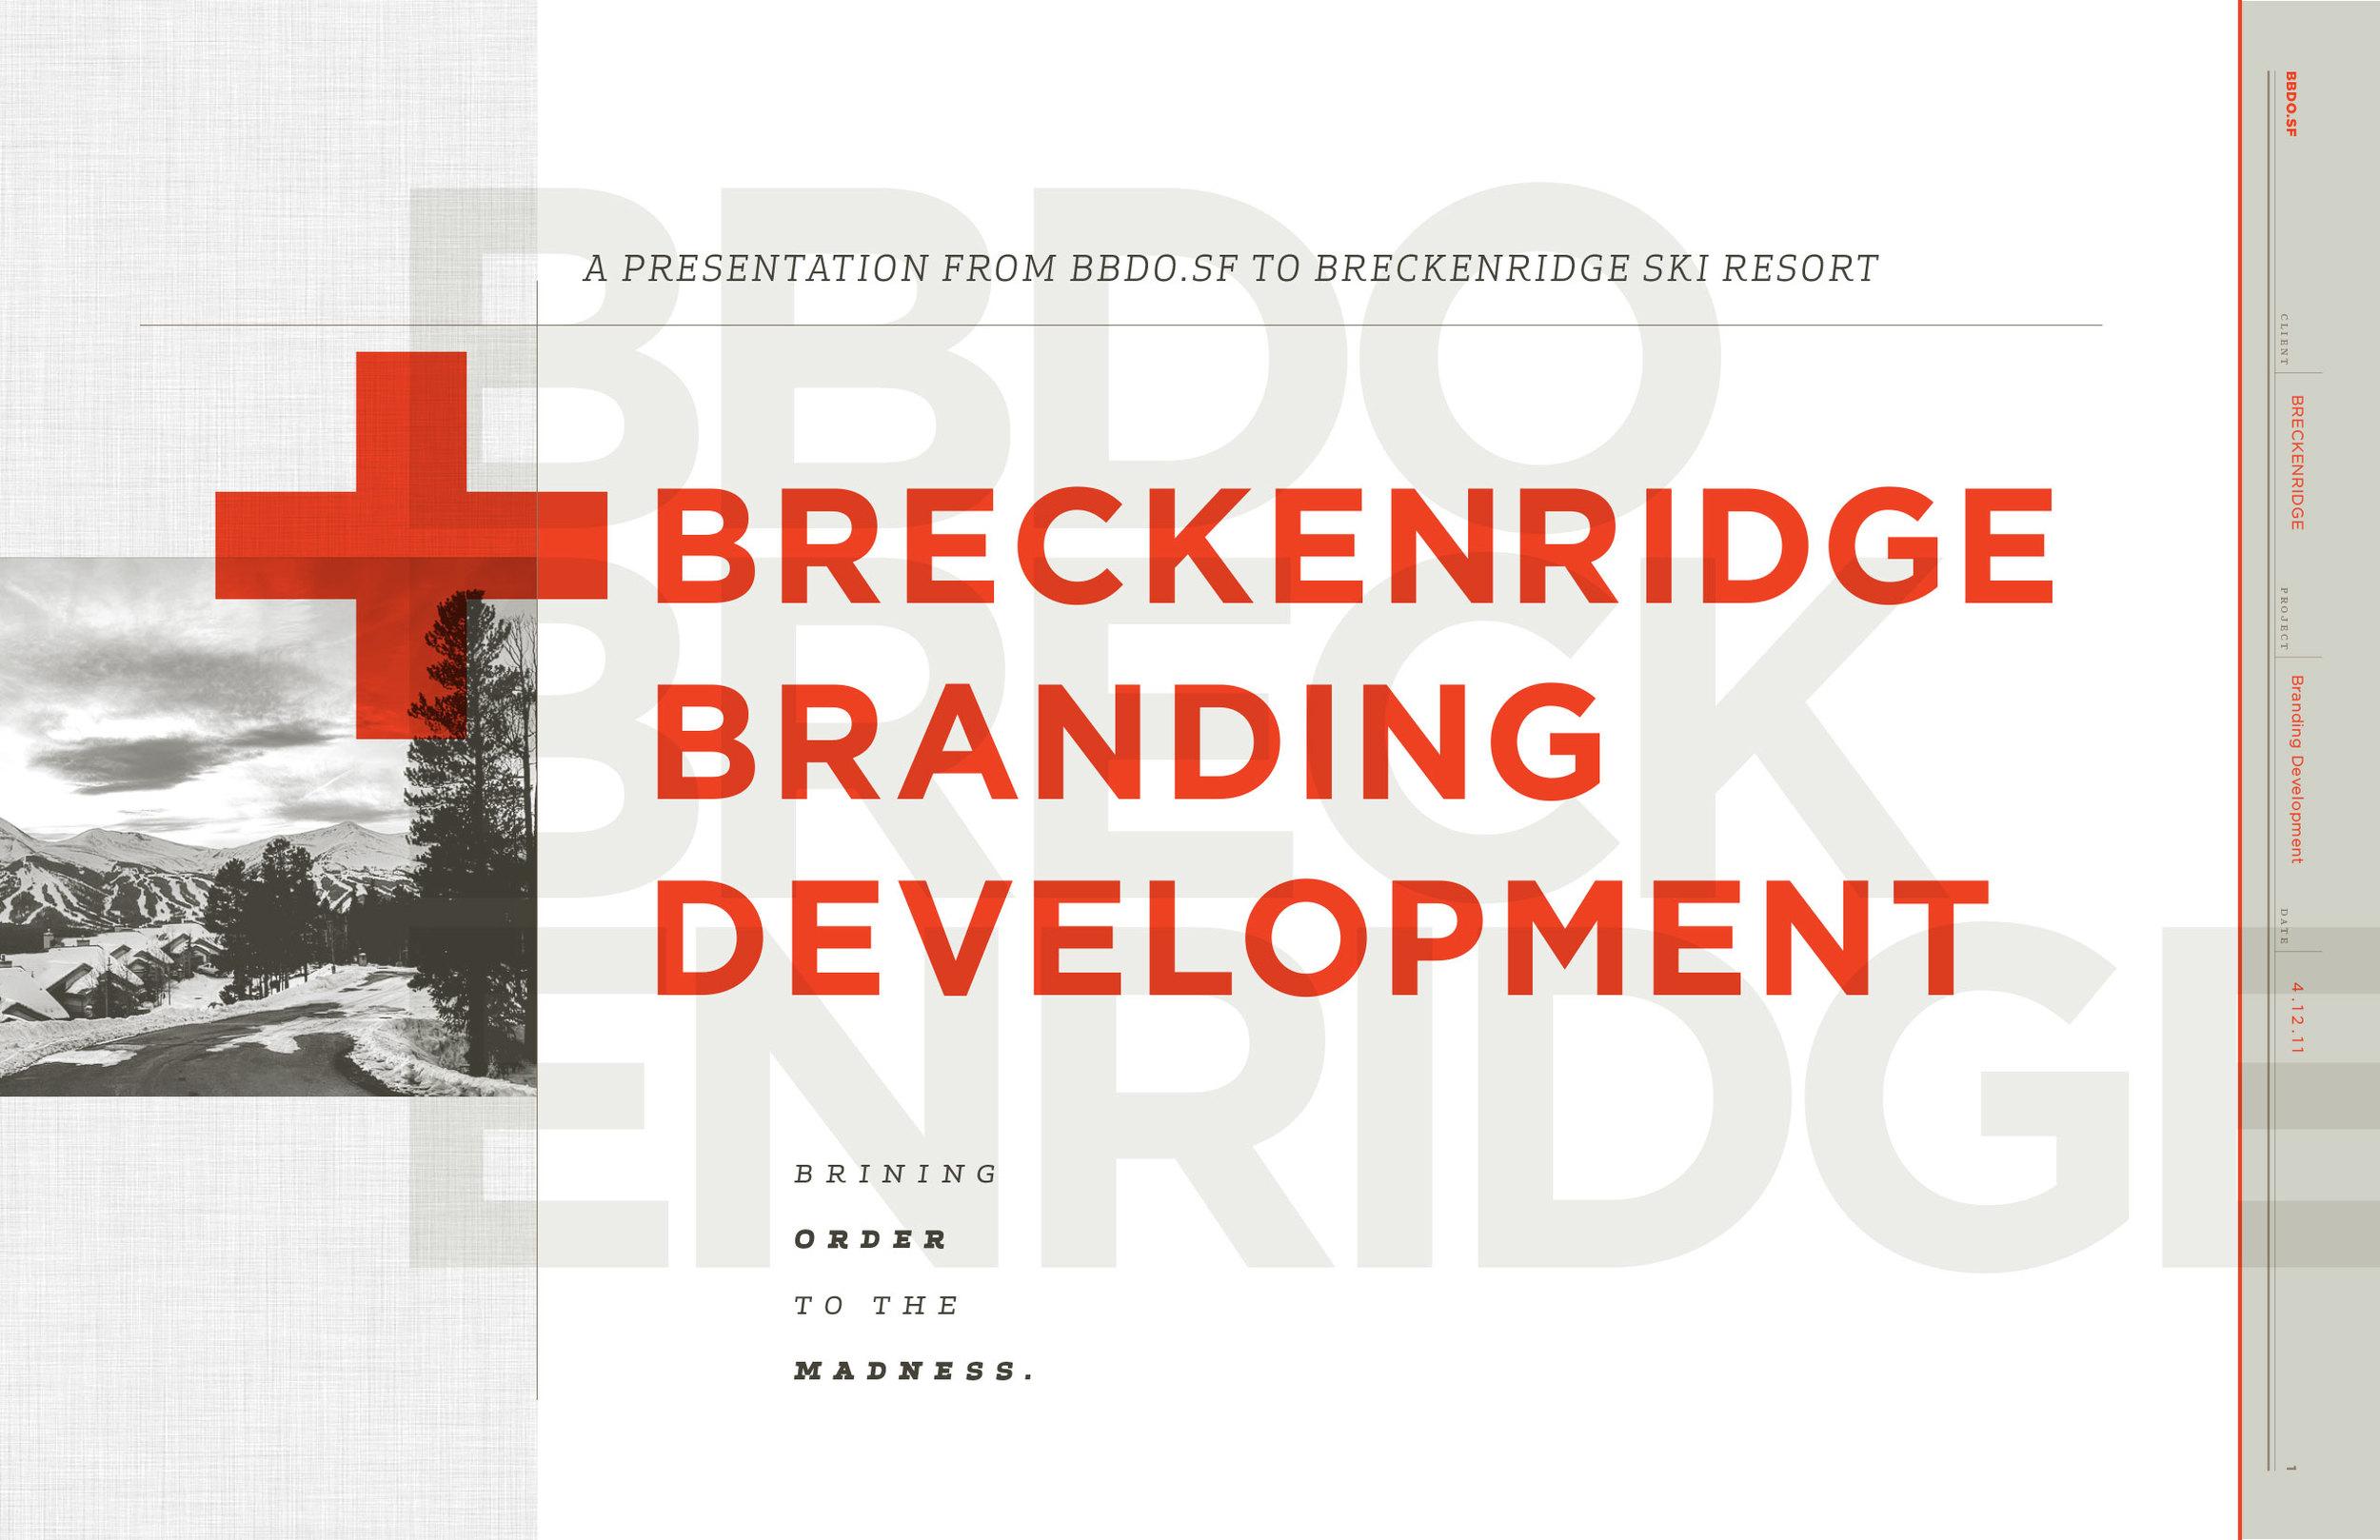 breck_branddev_book_1-1.jpg